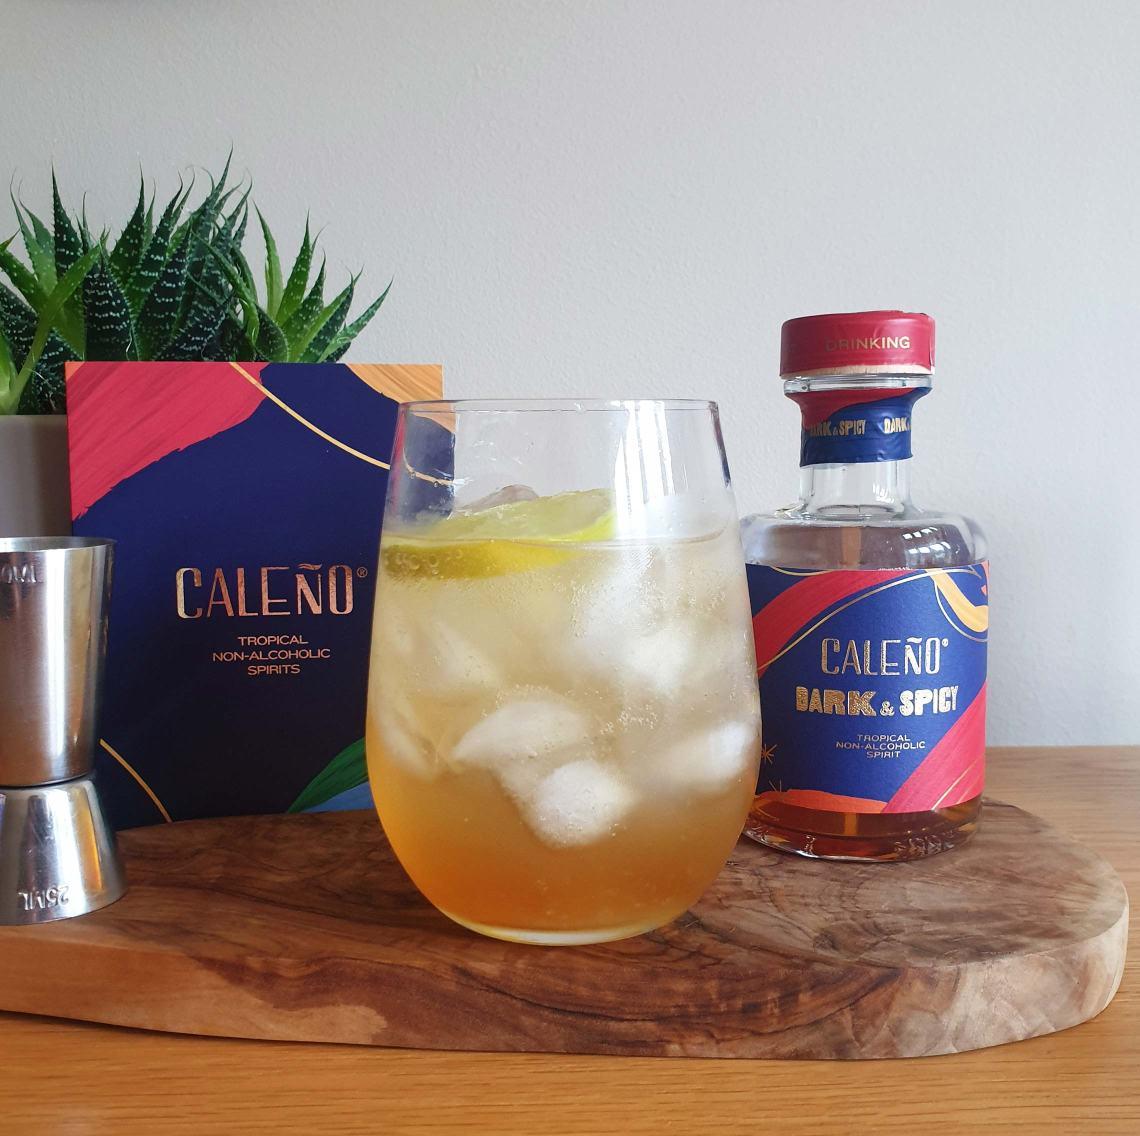 Caleño Drinks Non-Alcoholic Spirit, My Review - Female Original